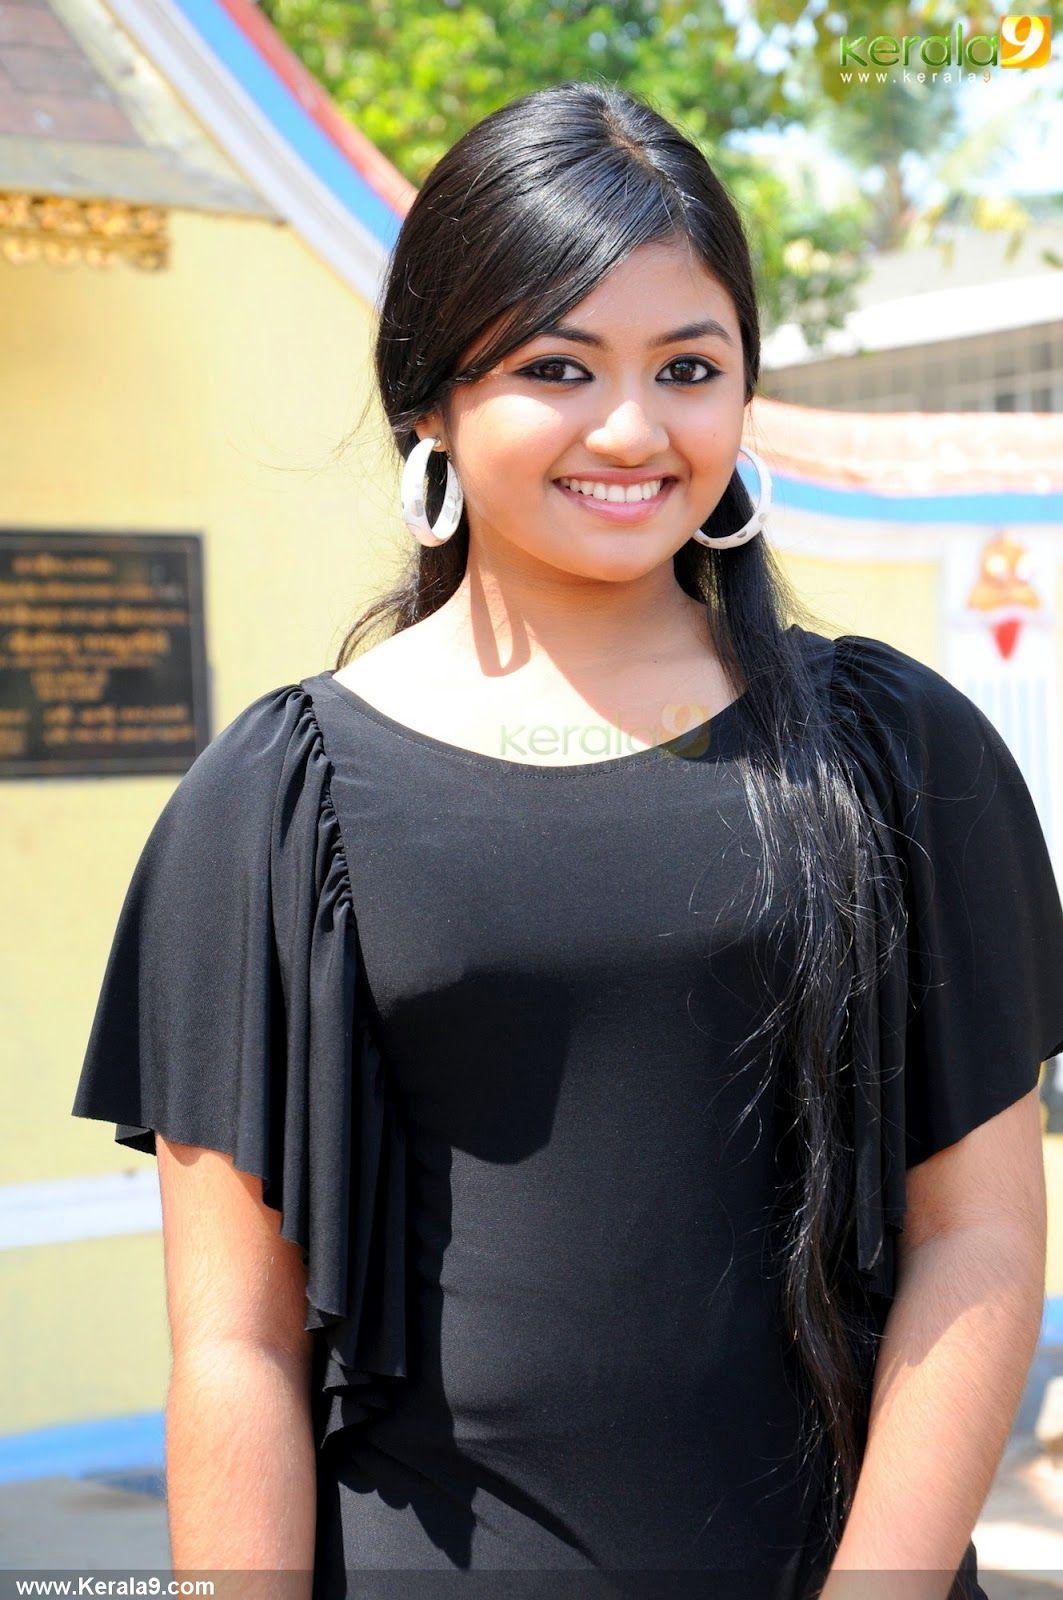 shalin zoya latest stills | mollywood | pinterest | india people